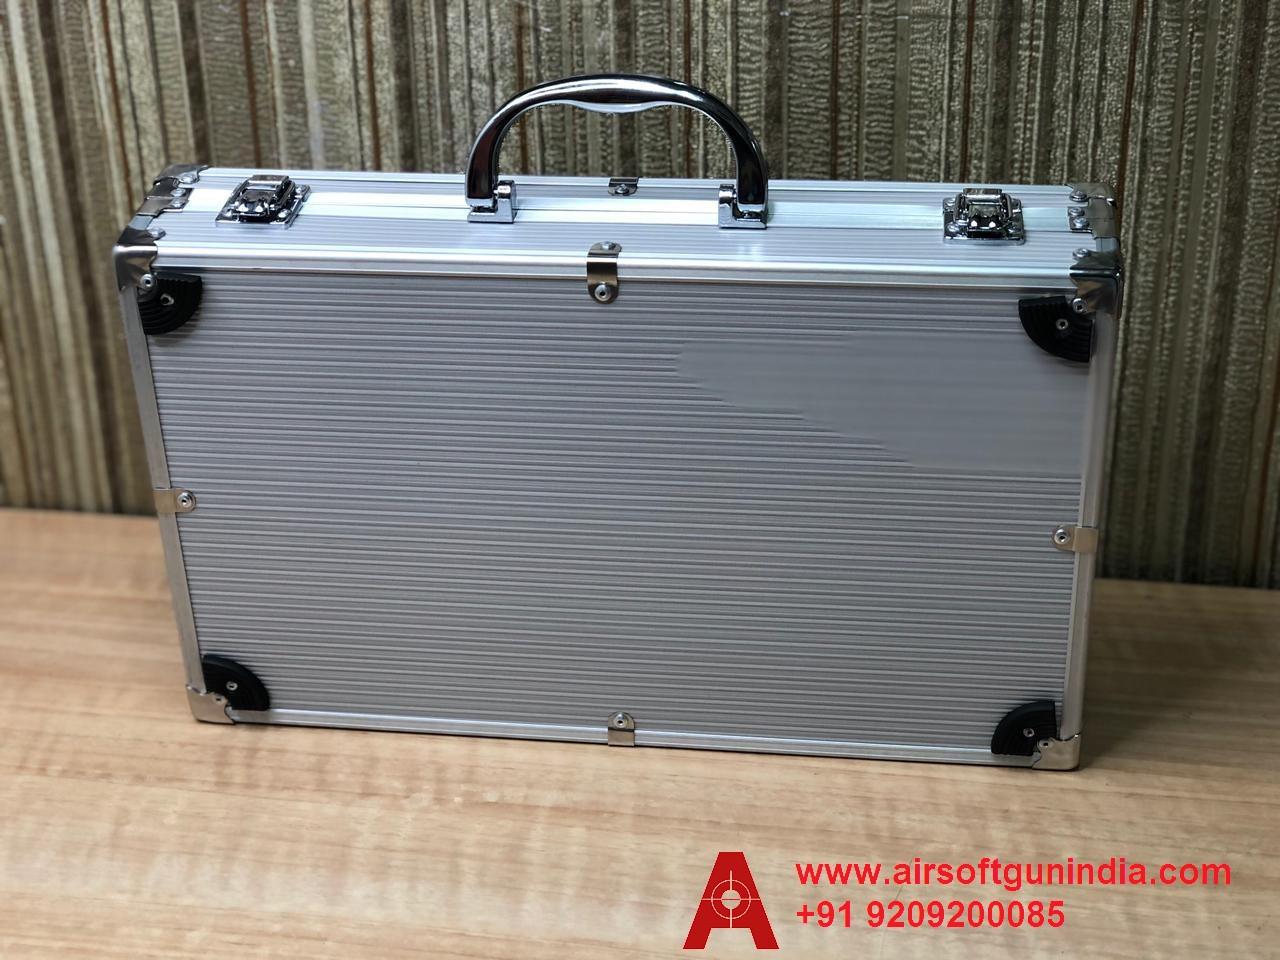 Customized Gun Case For Crosman 1911 CO2 Pellet Pistol Silver By Airsoft Gun India